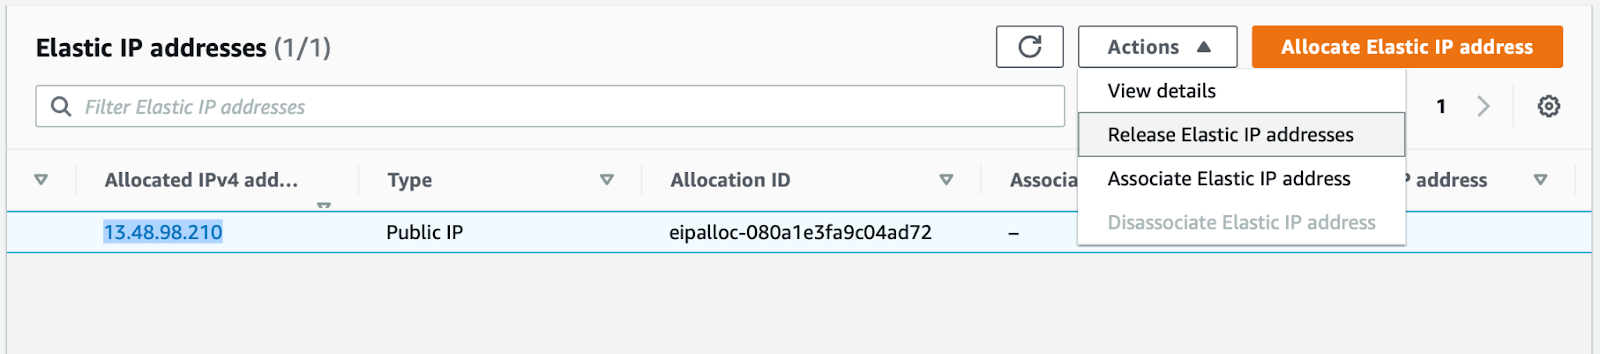 Elastic IP addresses Amazon EC2